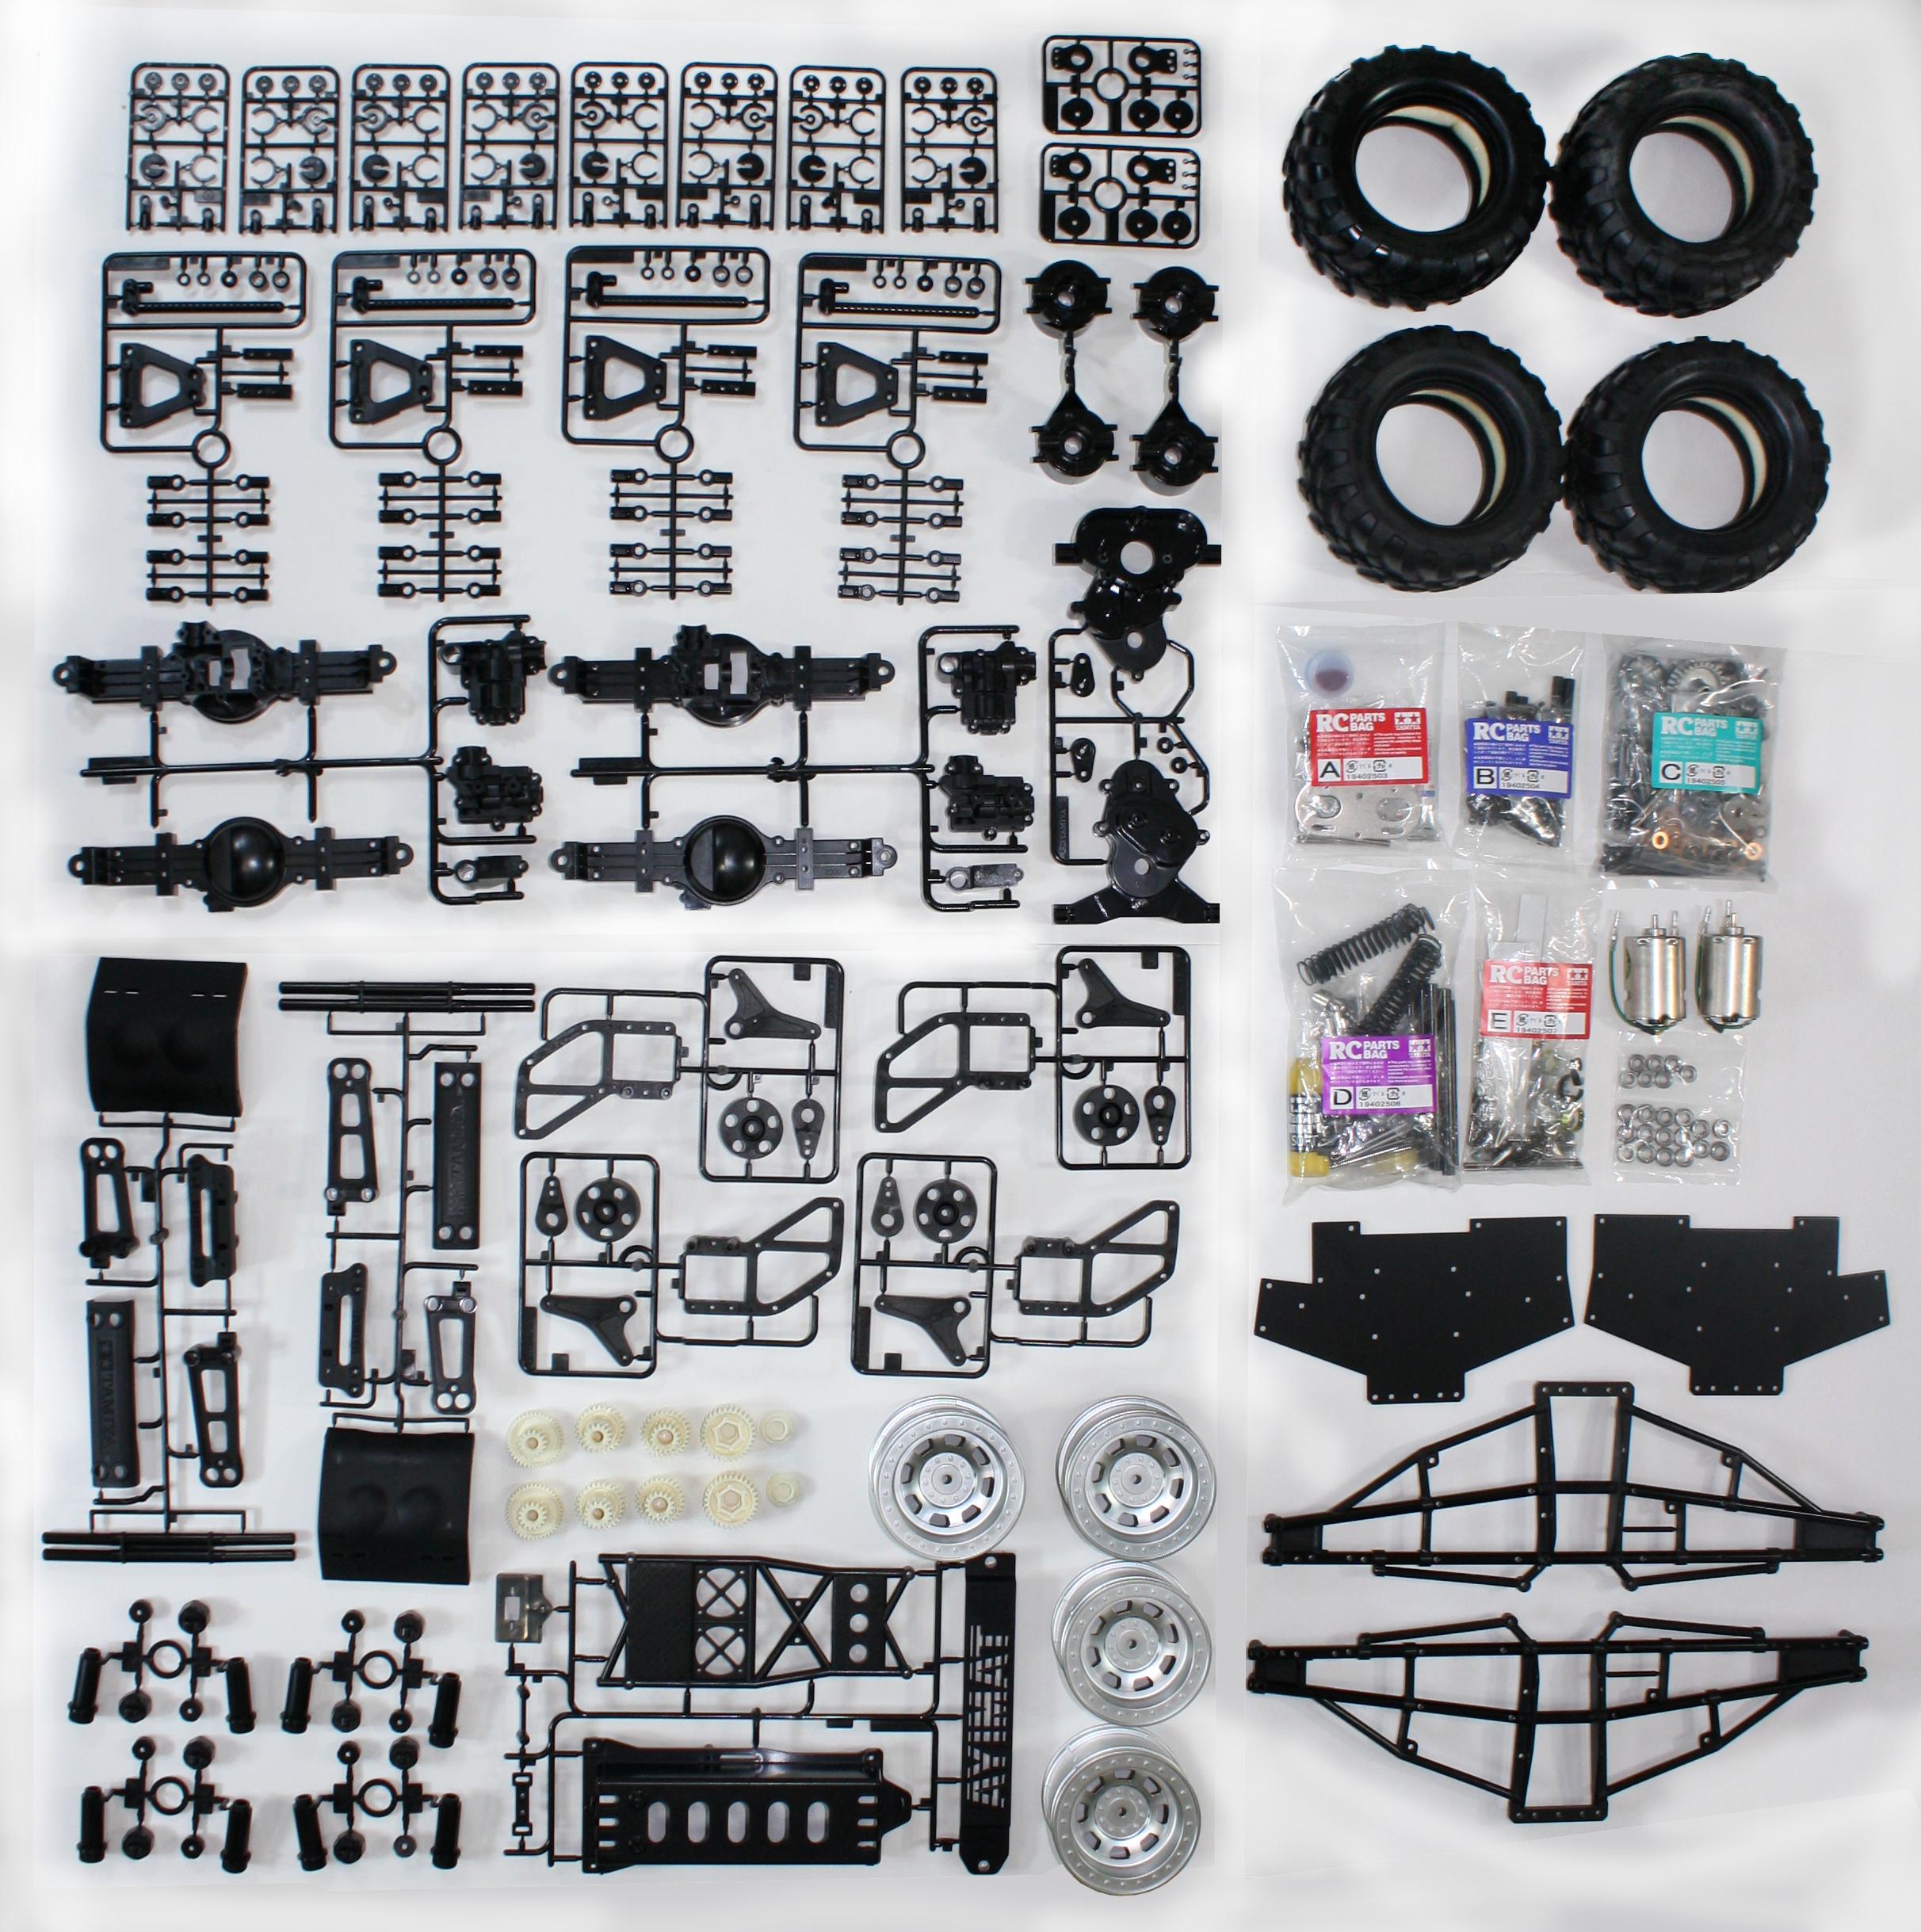 Tamiya TXT-2 Agrios Build